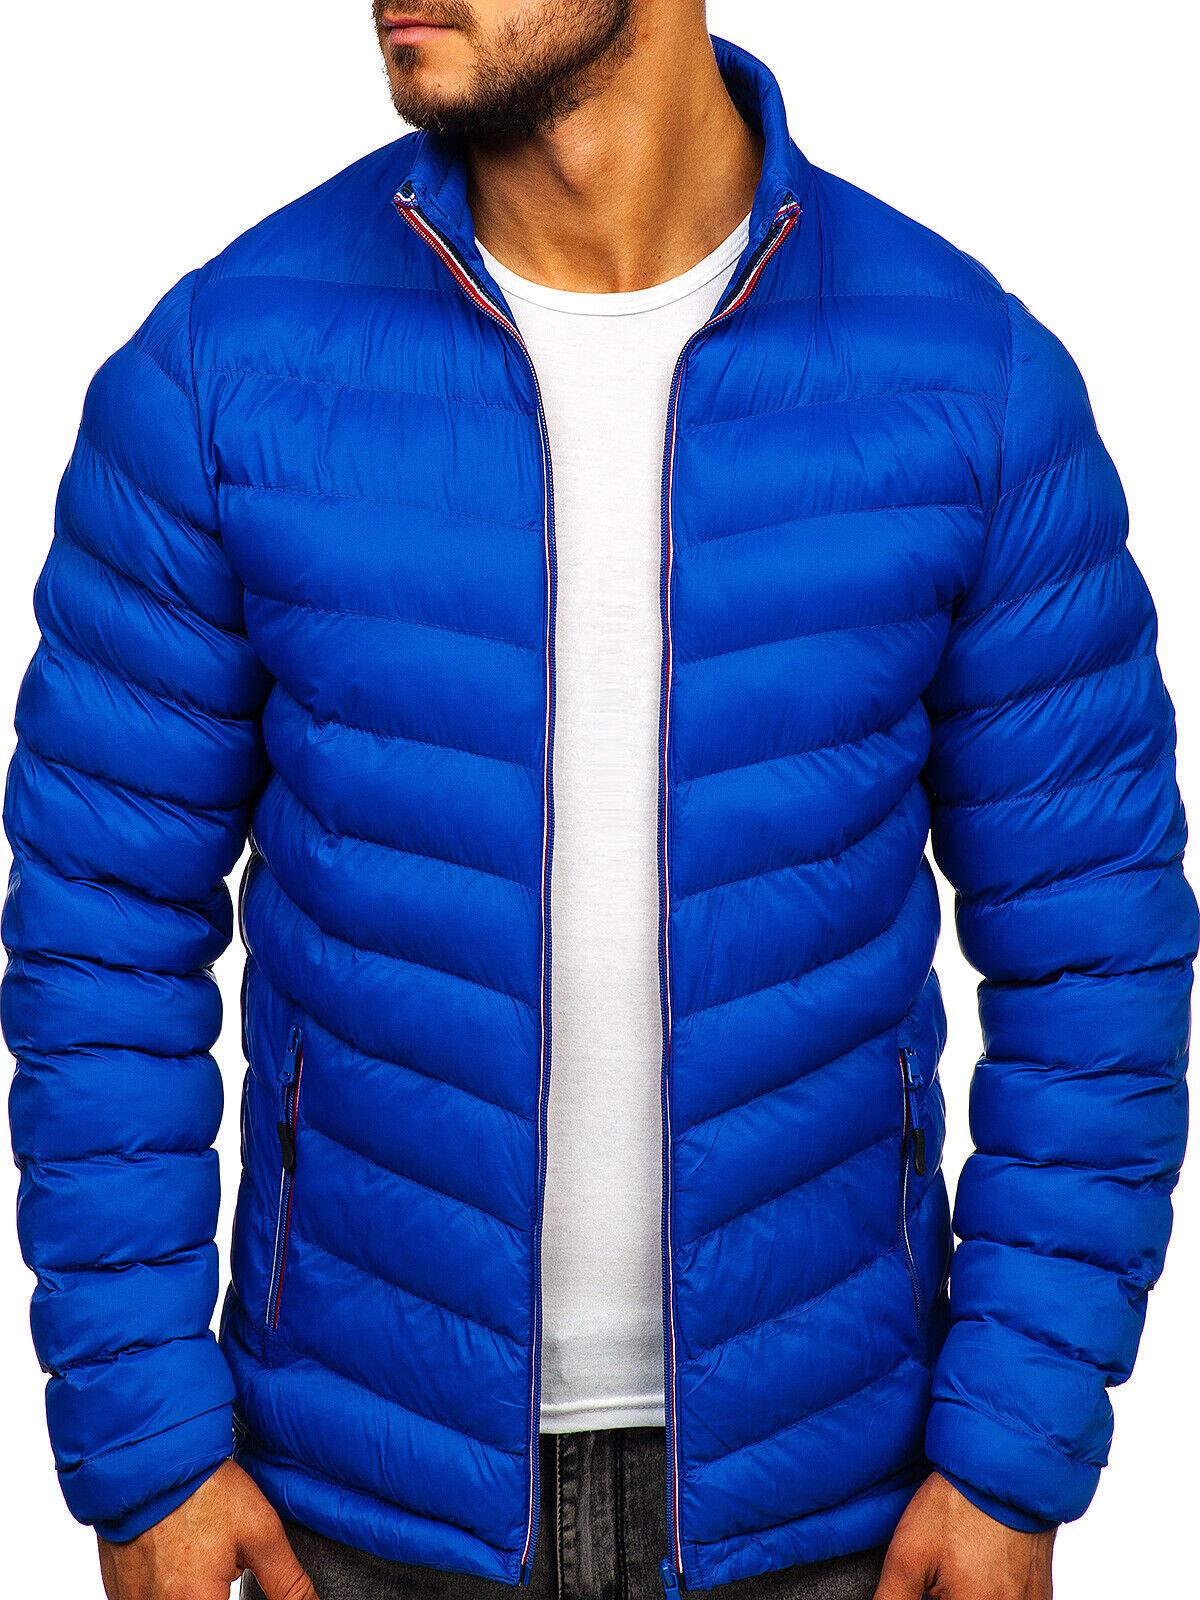 J.Style SM71 Blau